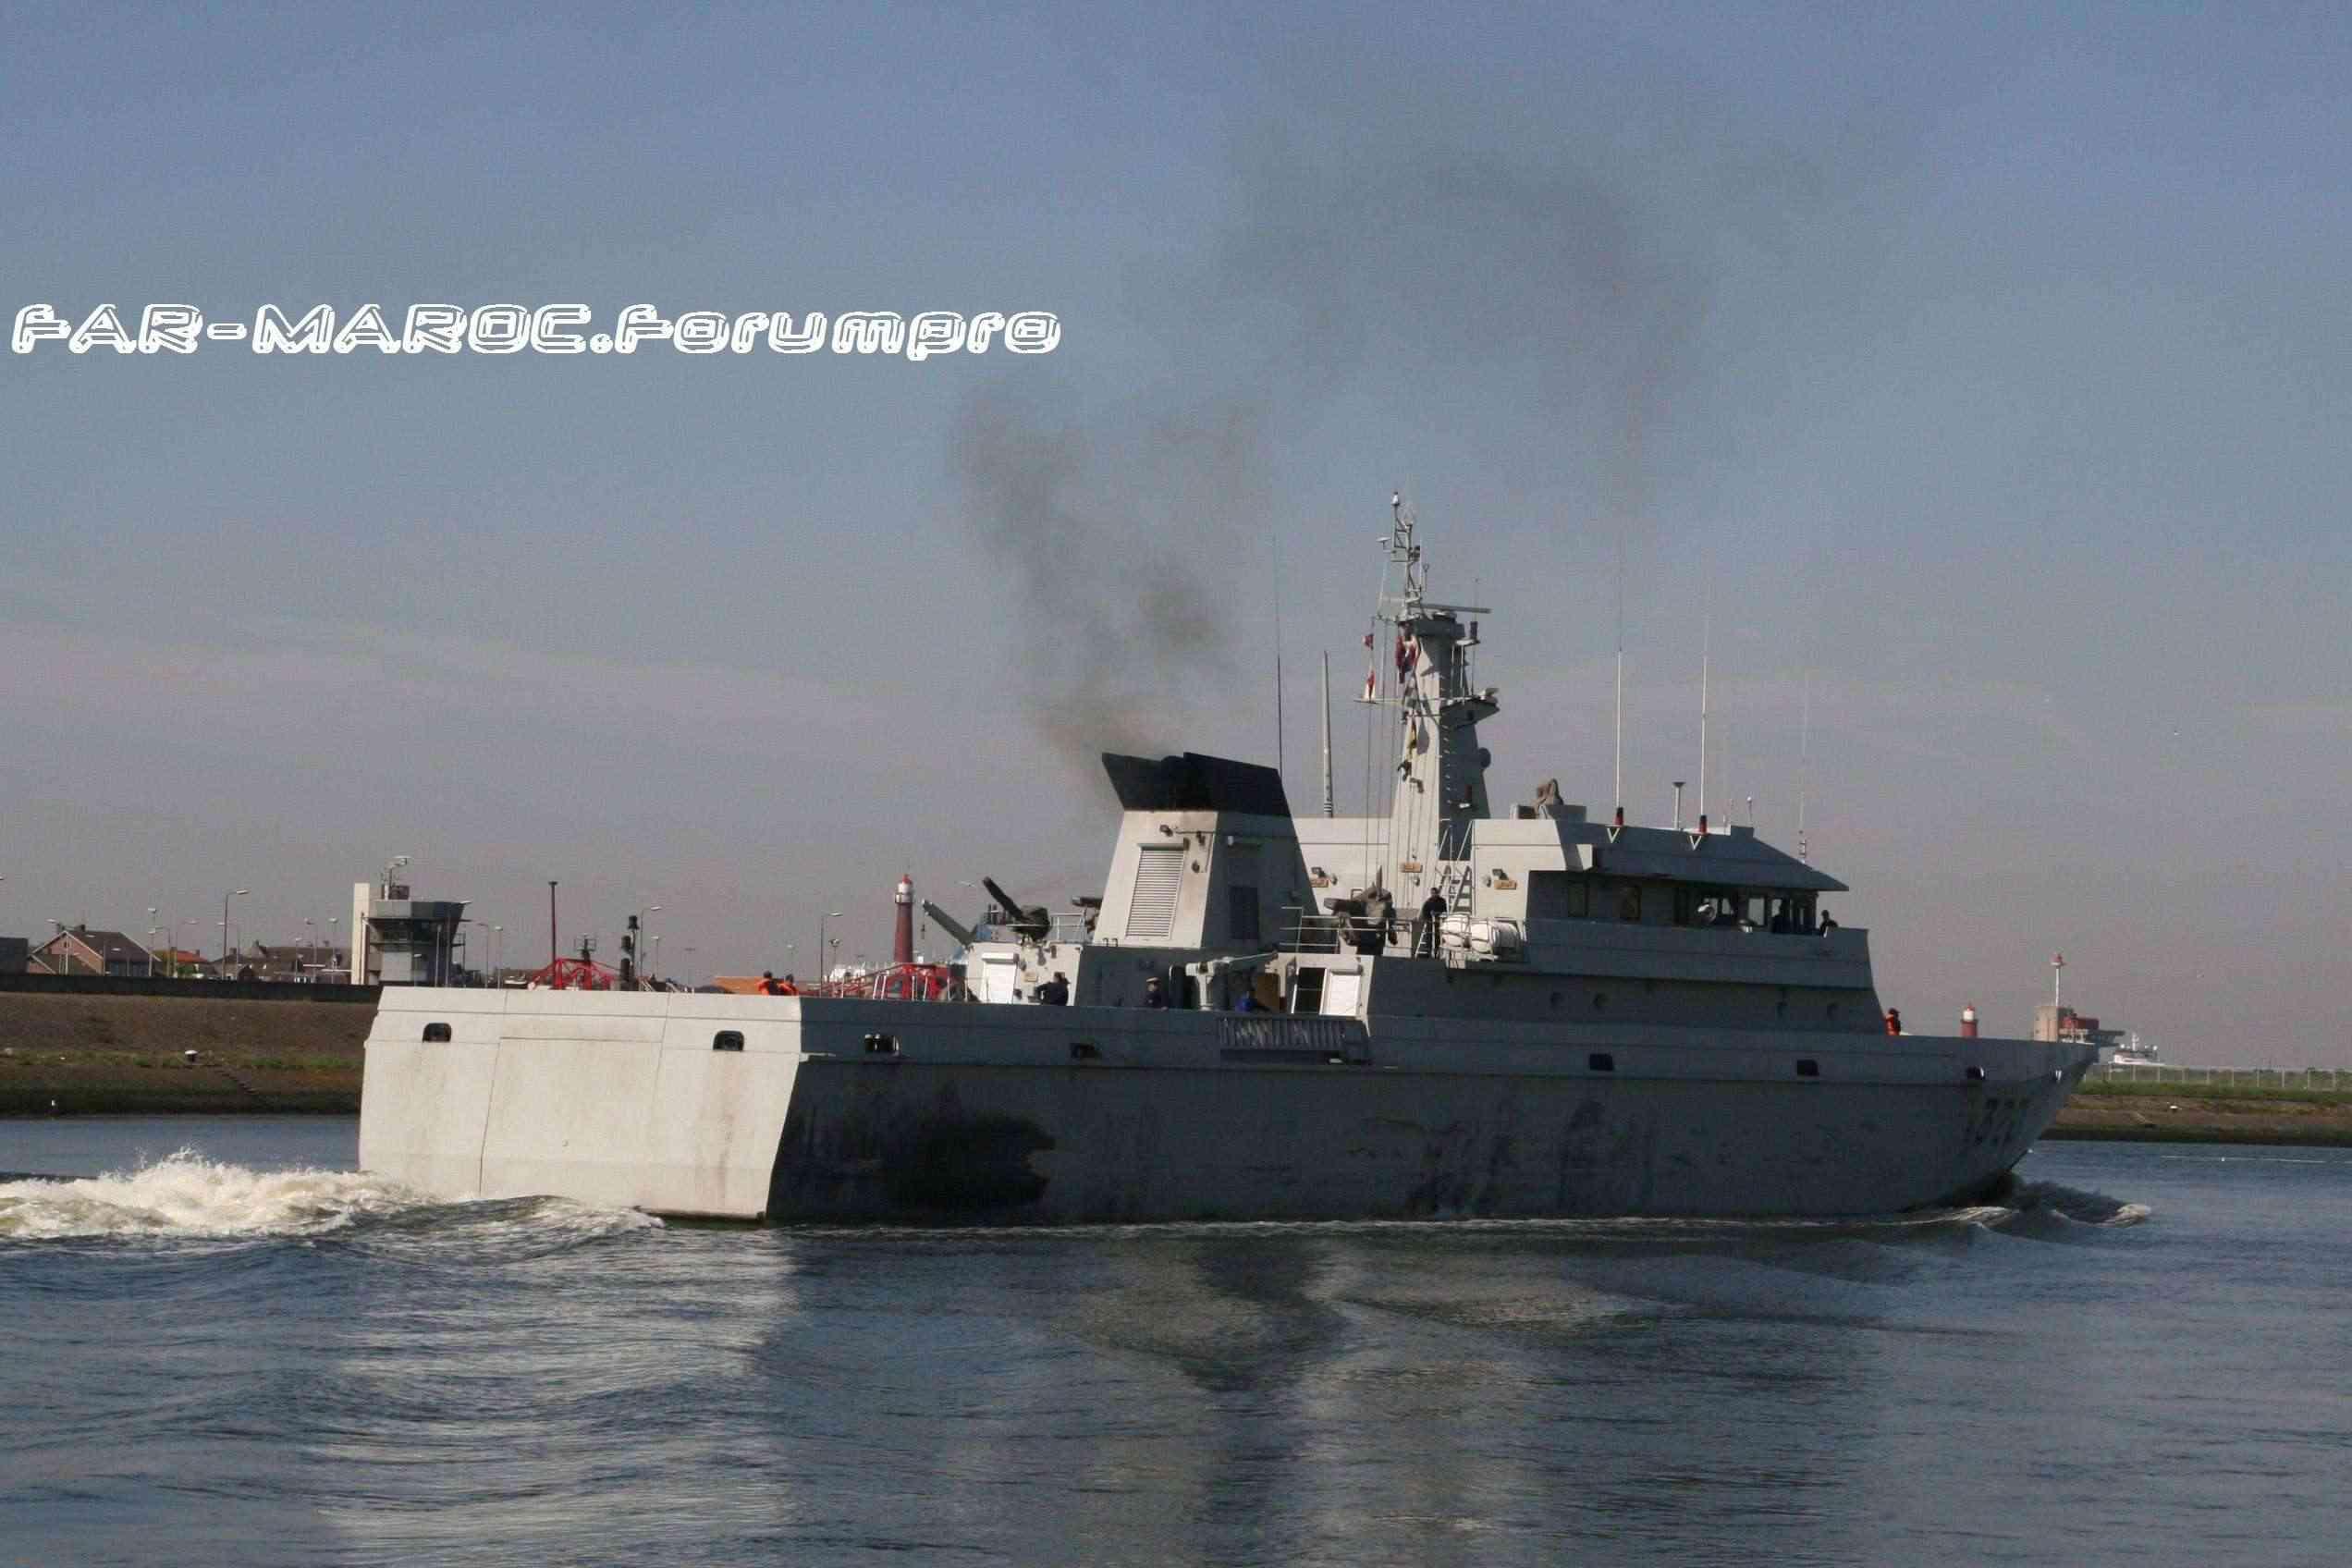 Royal Moroccan Navy Patrol Boats / Patrouilleurs de la Marine Marocaine - Page 2 Shipph12